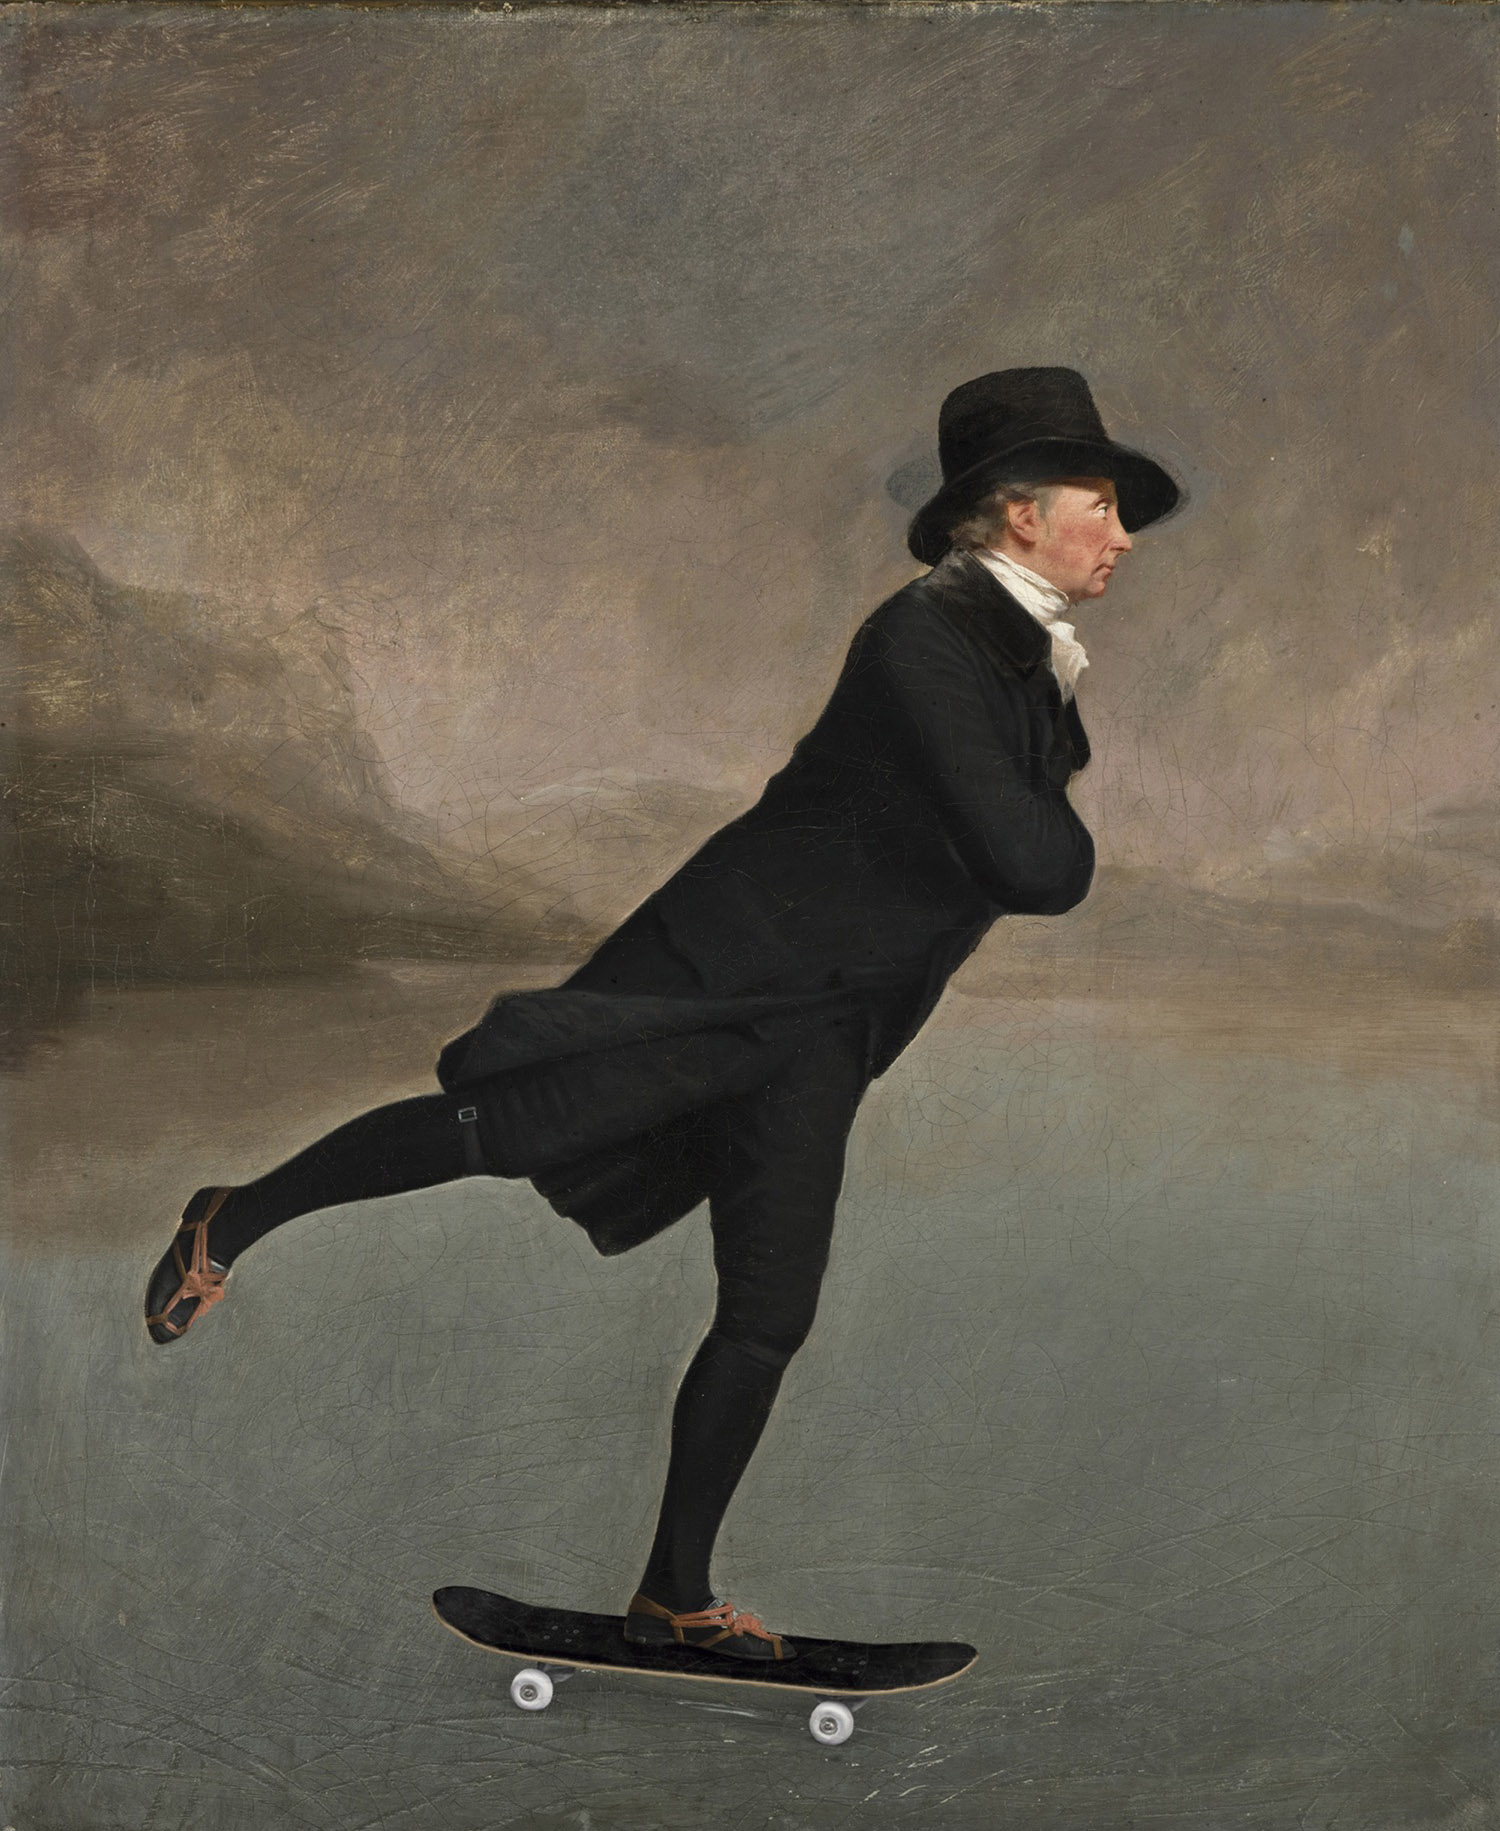 The Skating Minister Gonzalo Sainz